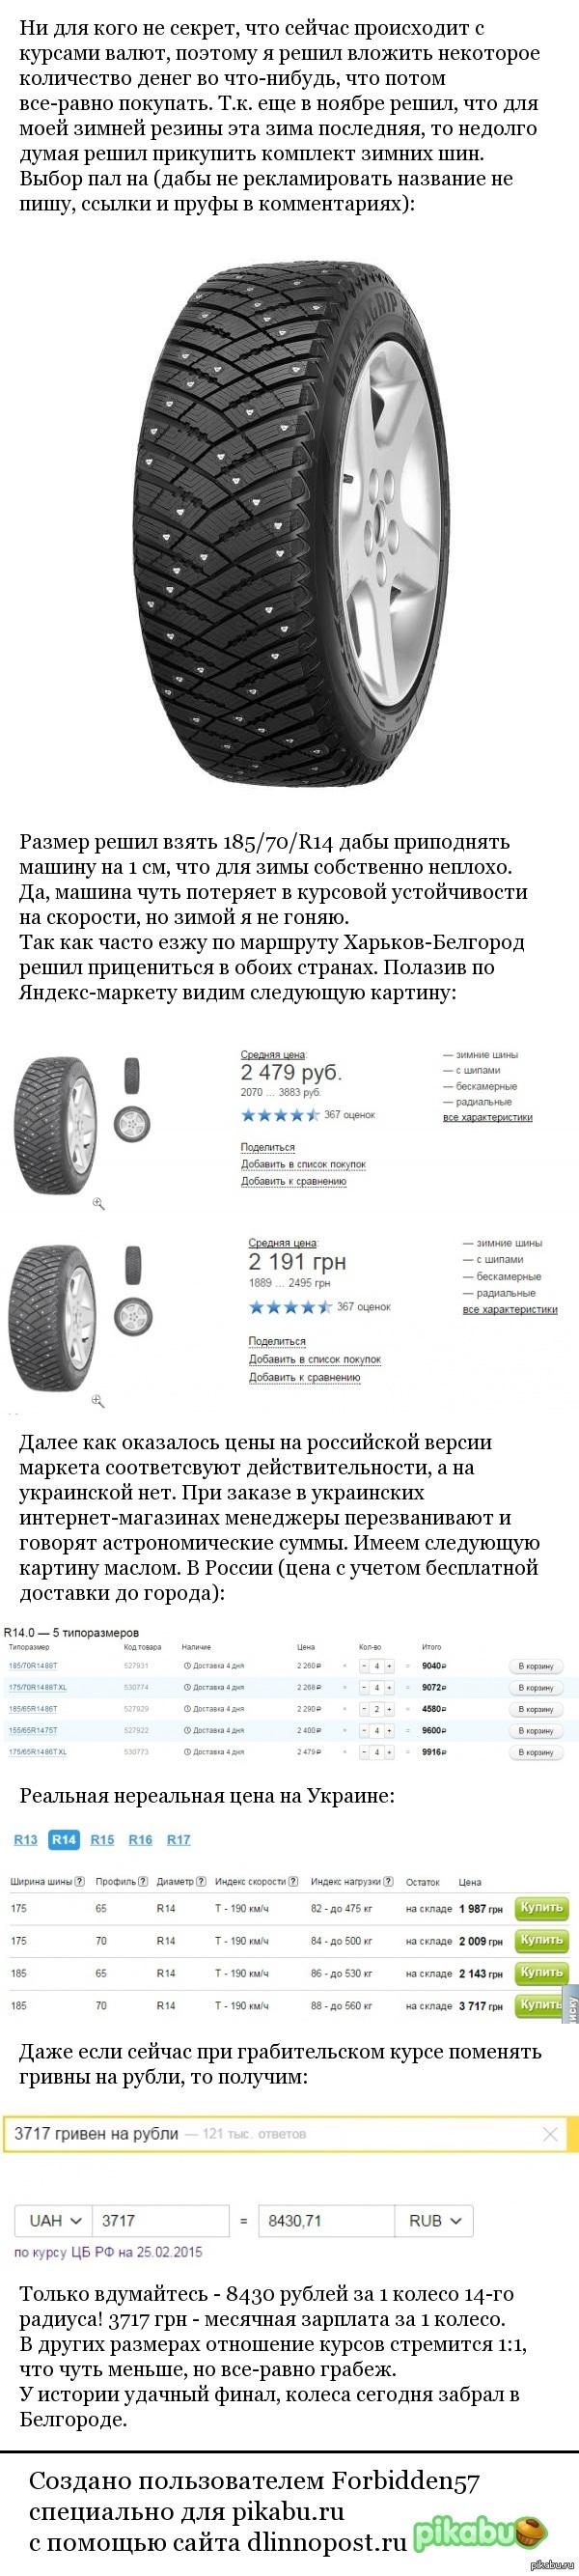 "Жити по новому или спекулянты-торгаши. Навеяно постом <a href=""http://pikabu.ru/story/telefon_3114104"">http://pikabu.ru/story/_3114104</a>"